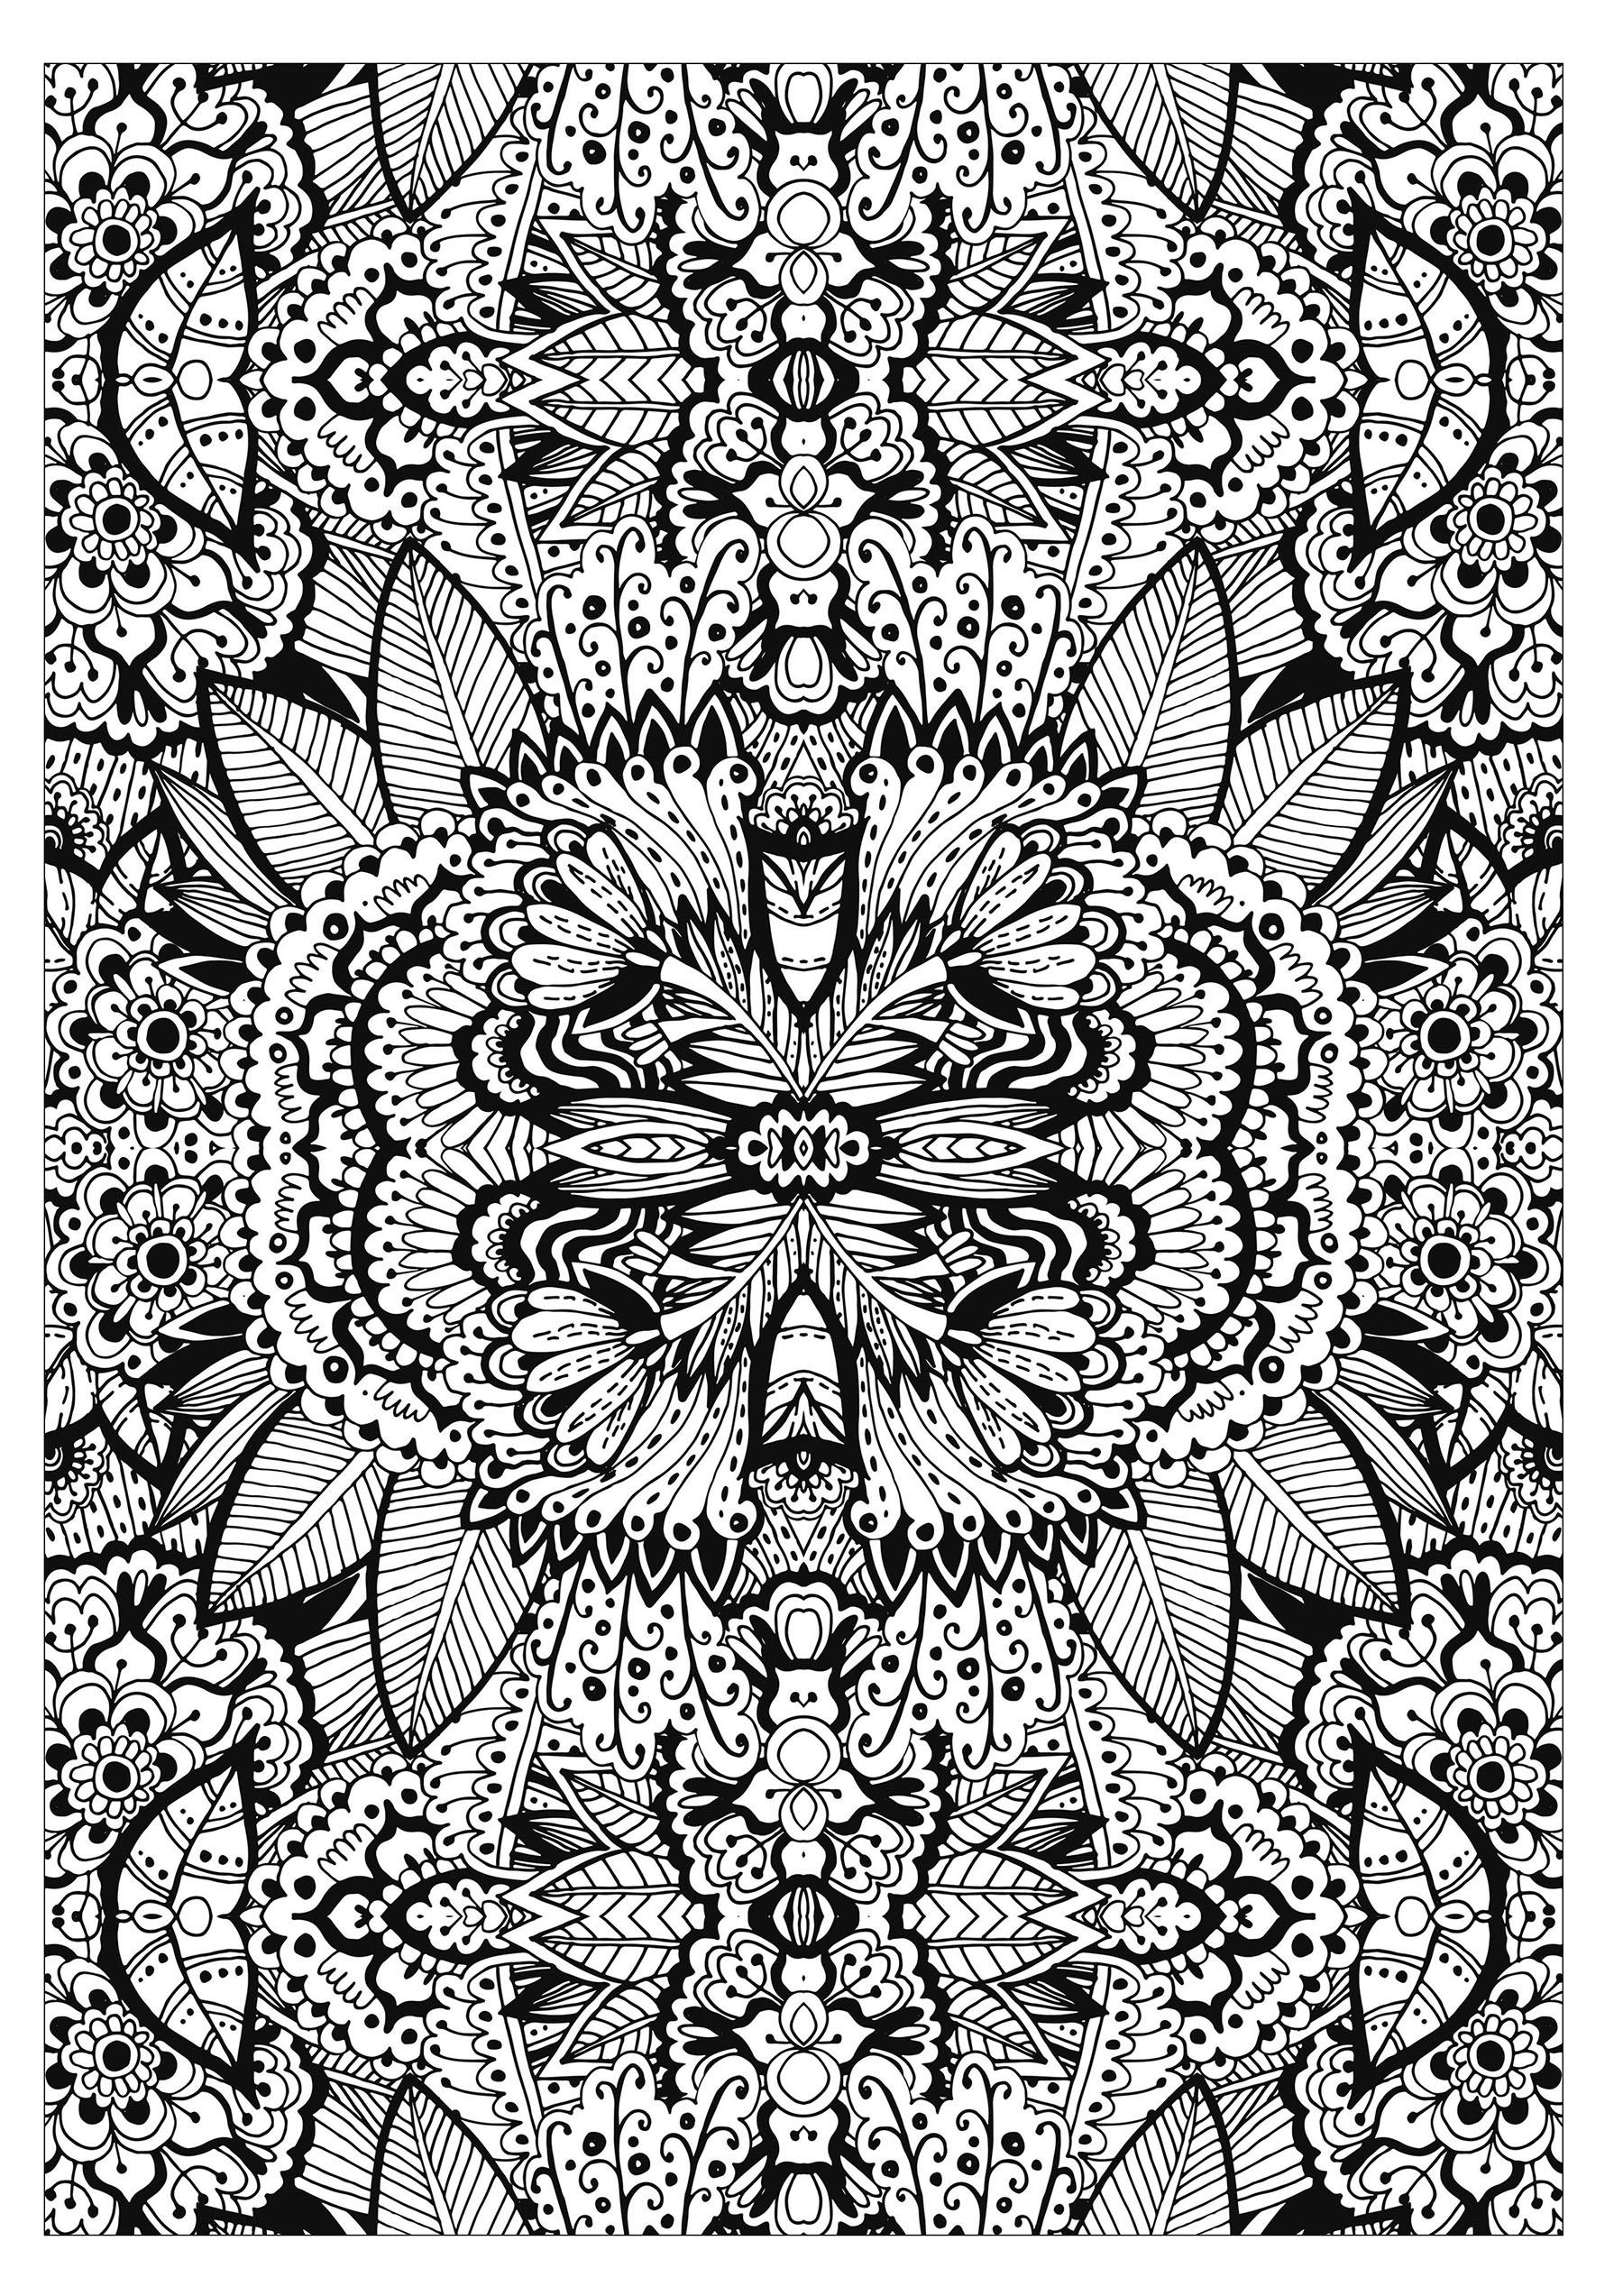 tapis de fleurs tres complexe fleurs et v g tation. Black Bedroom Furniture Sets. Home Design Ideas